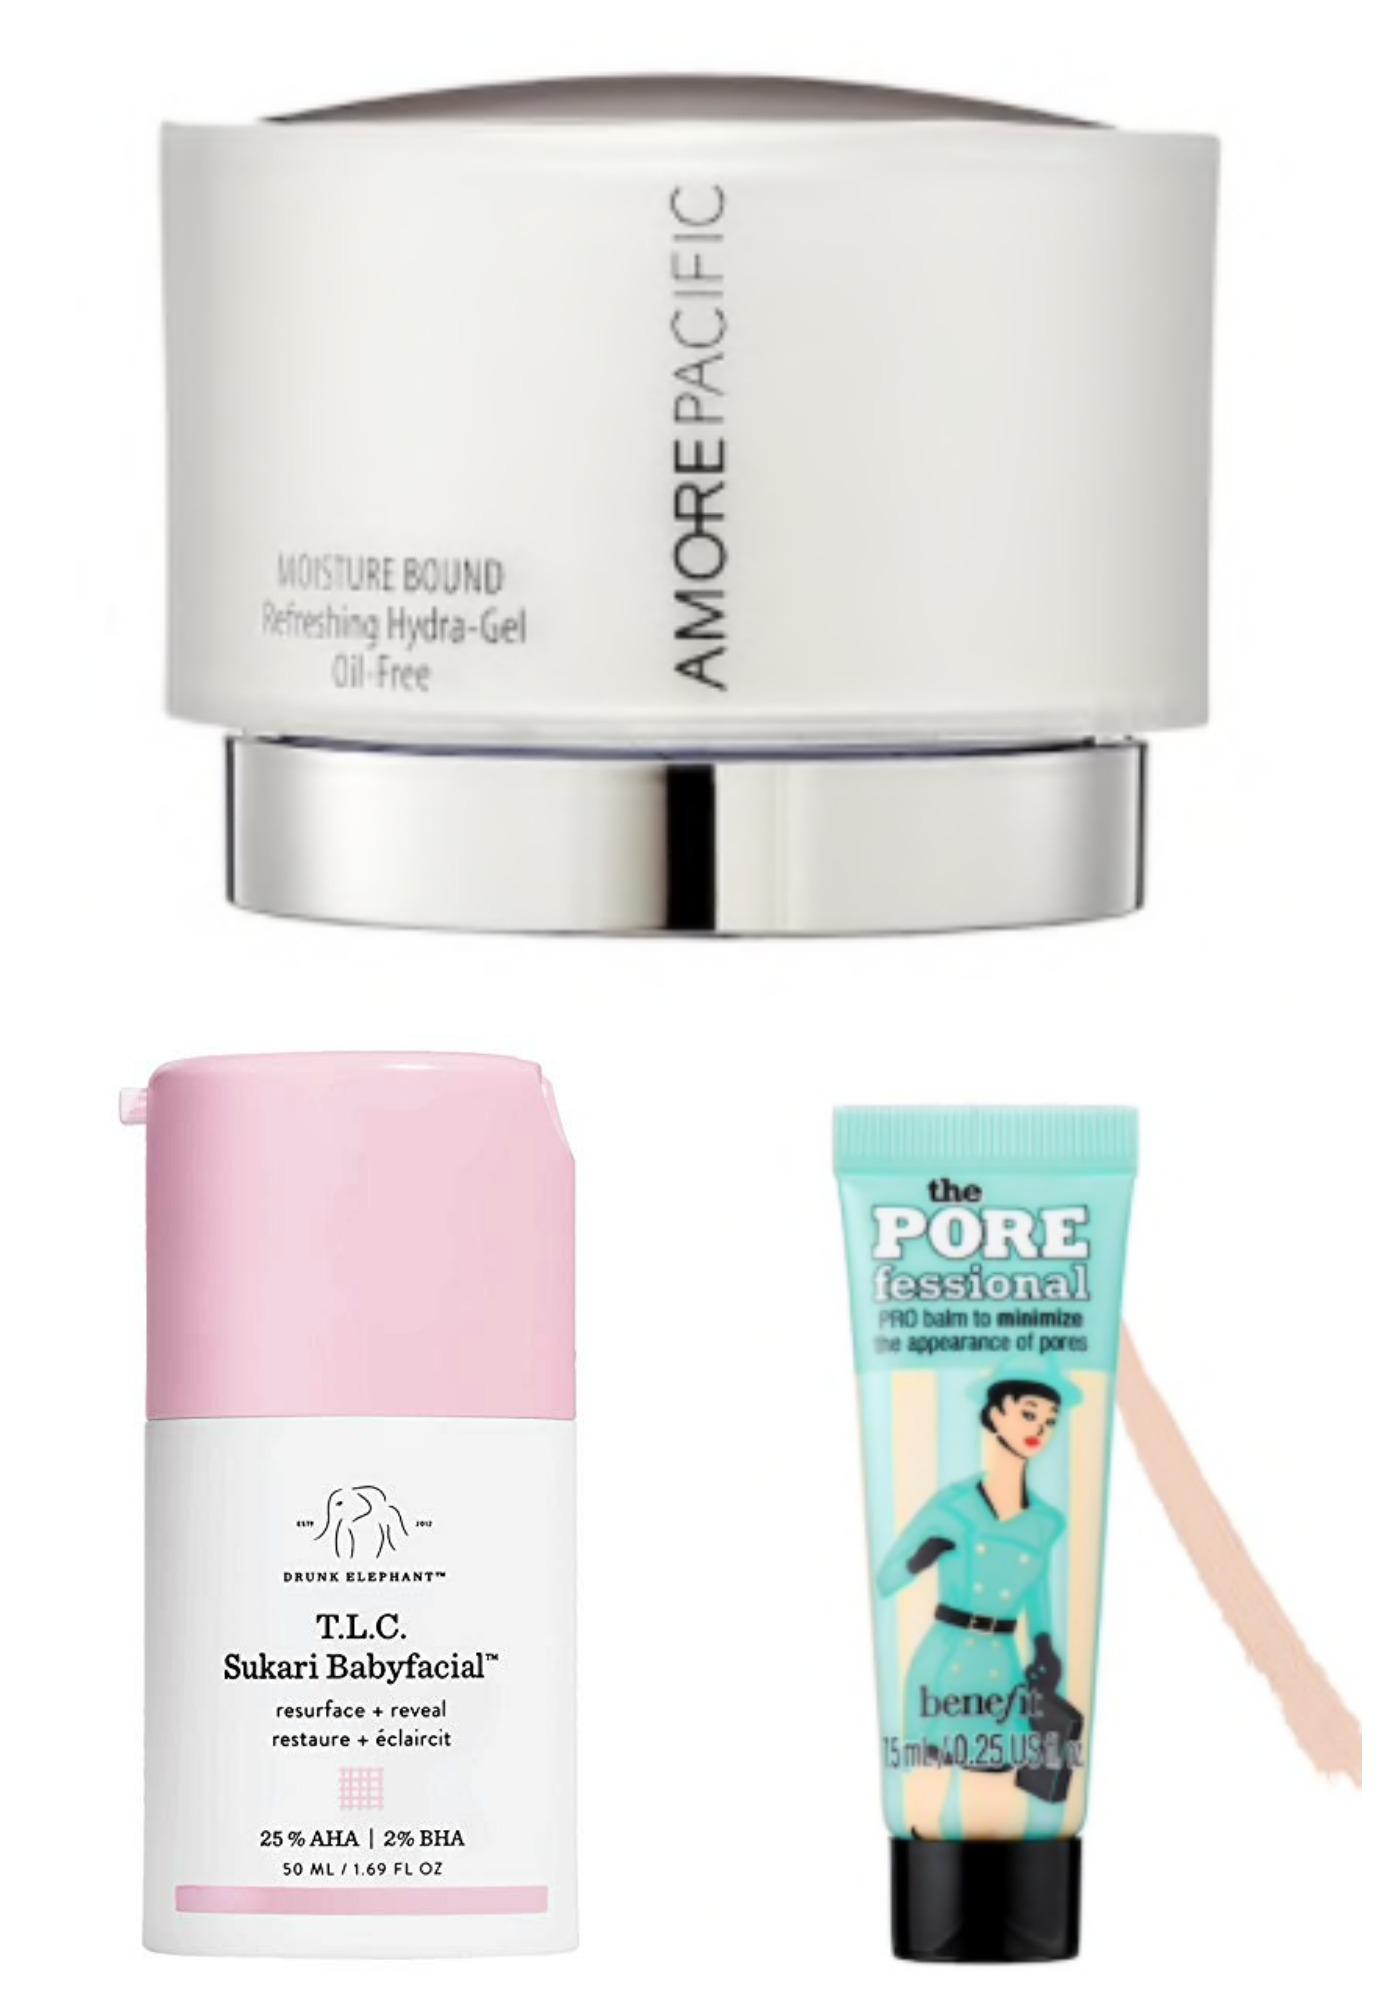 Sephora favorite skin products.jpg